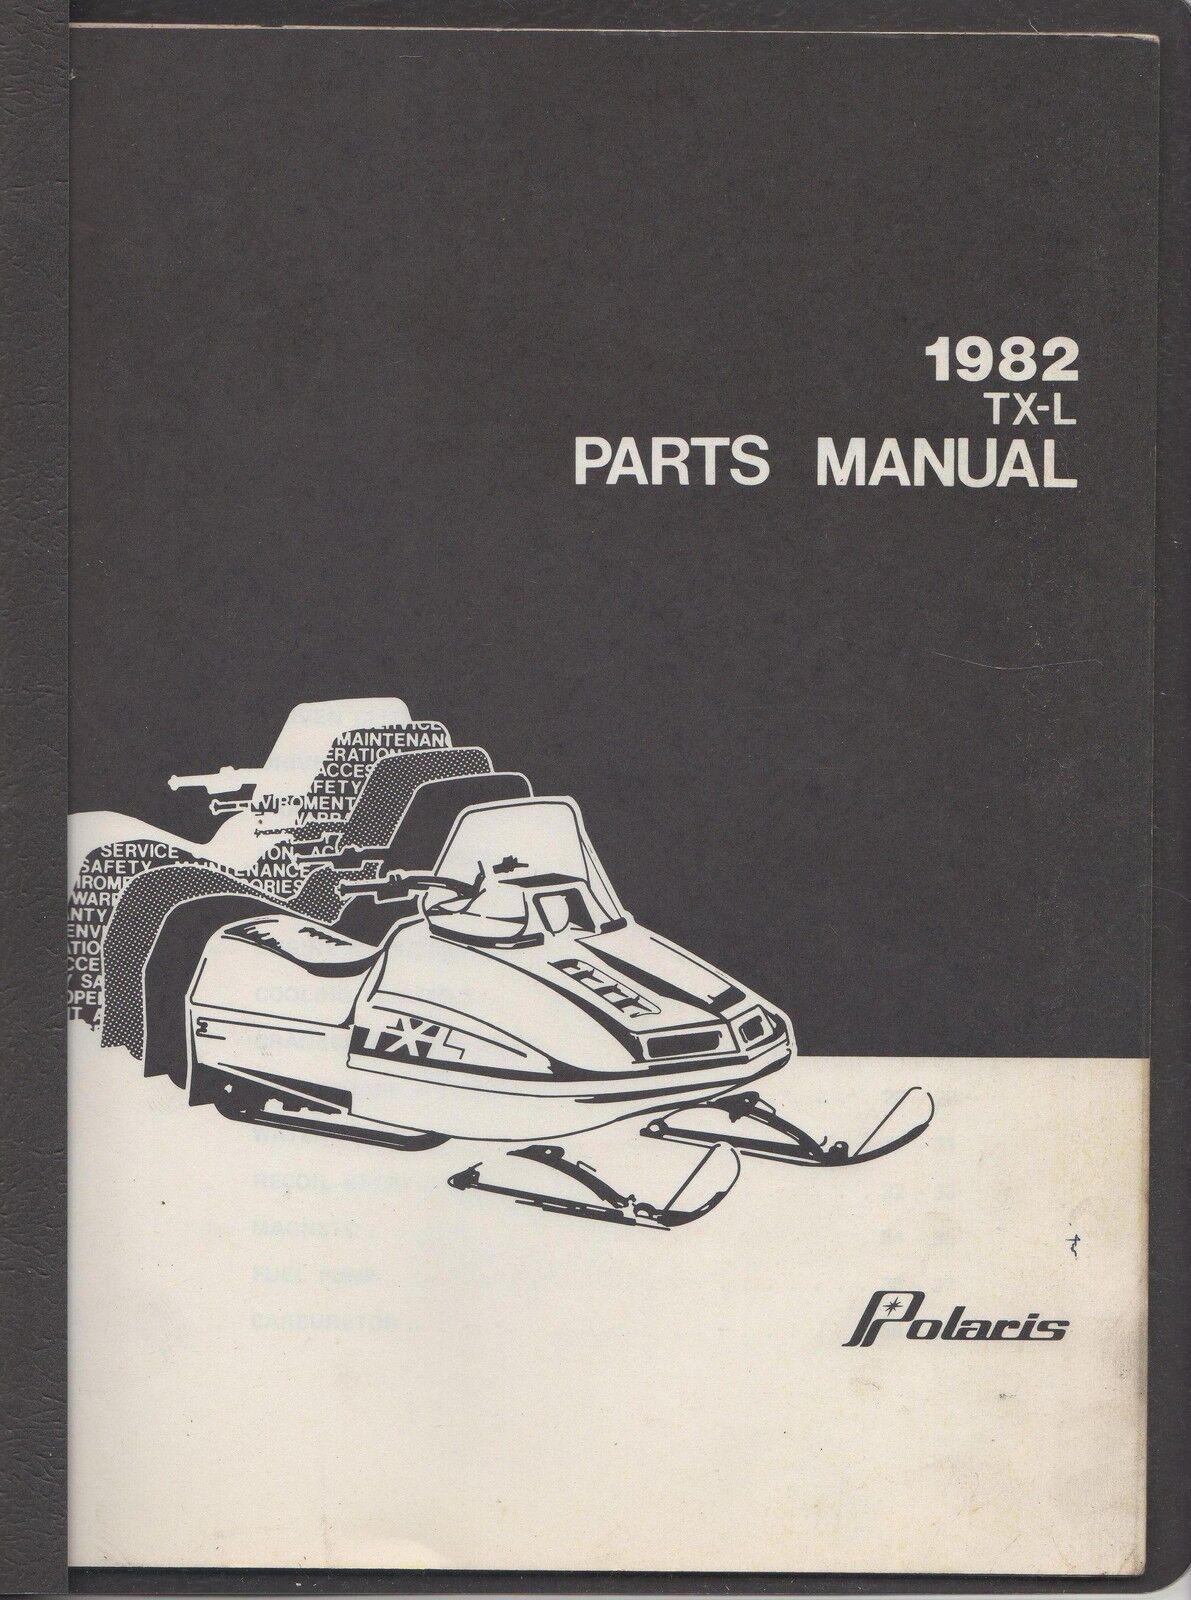 1982 POLARIS SNOWMOBILE TX-L PARTS MANUAL